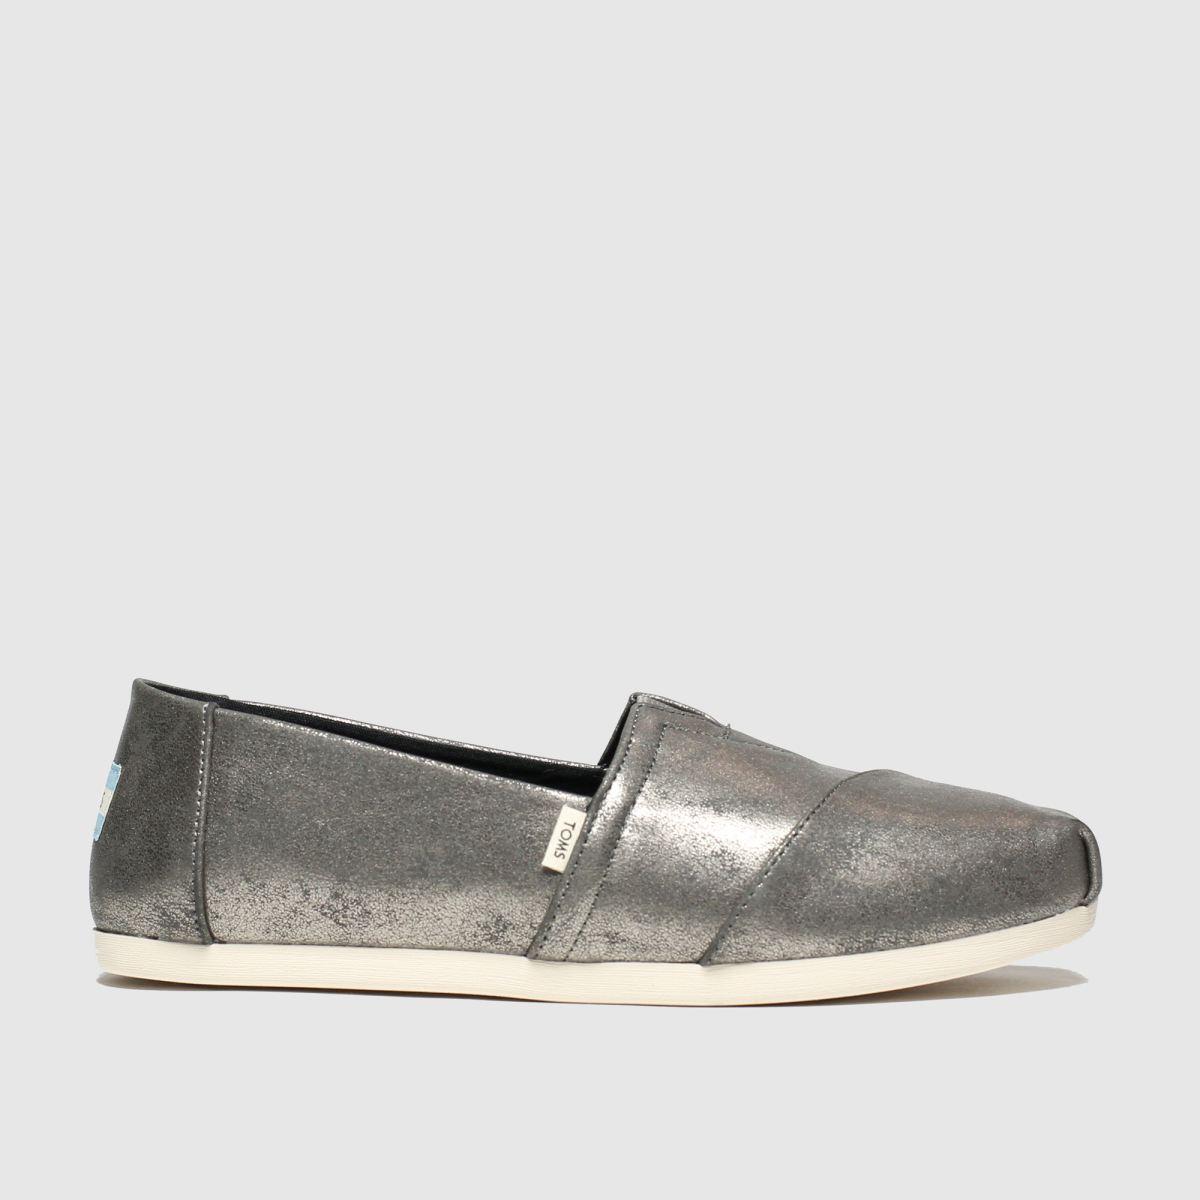 Toms Dark Grey Alpargata Metallic Flat Shoes